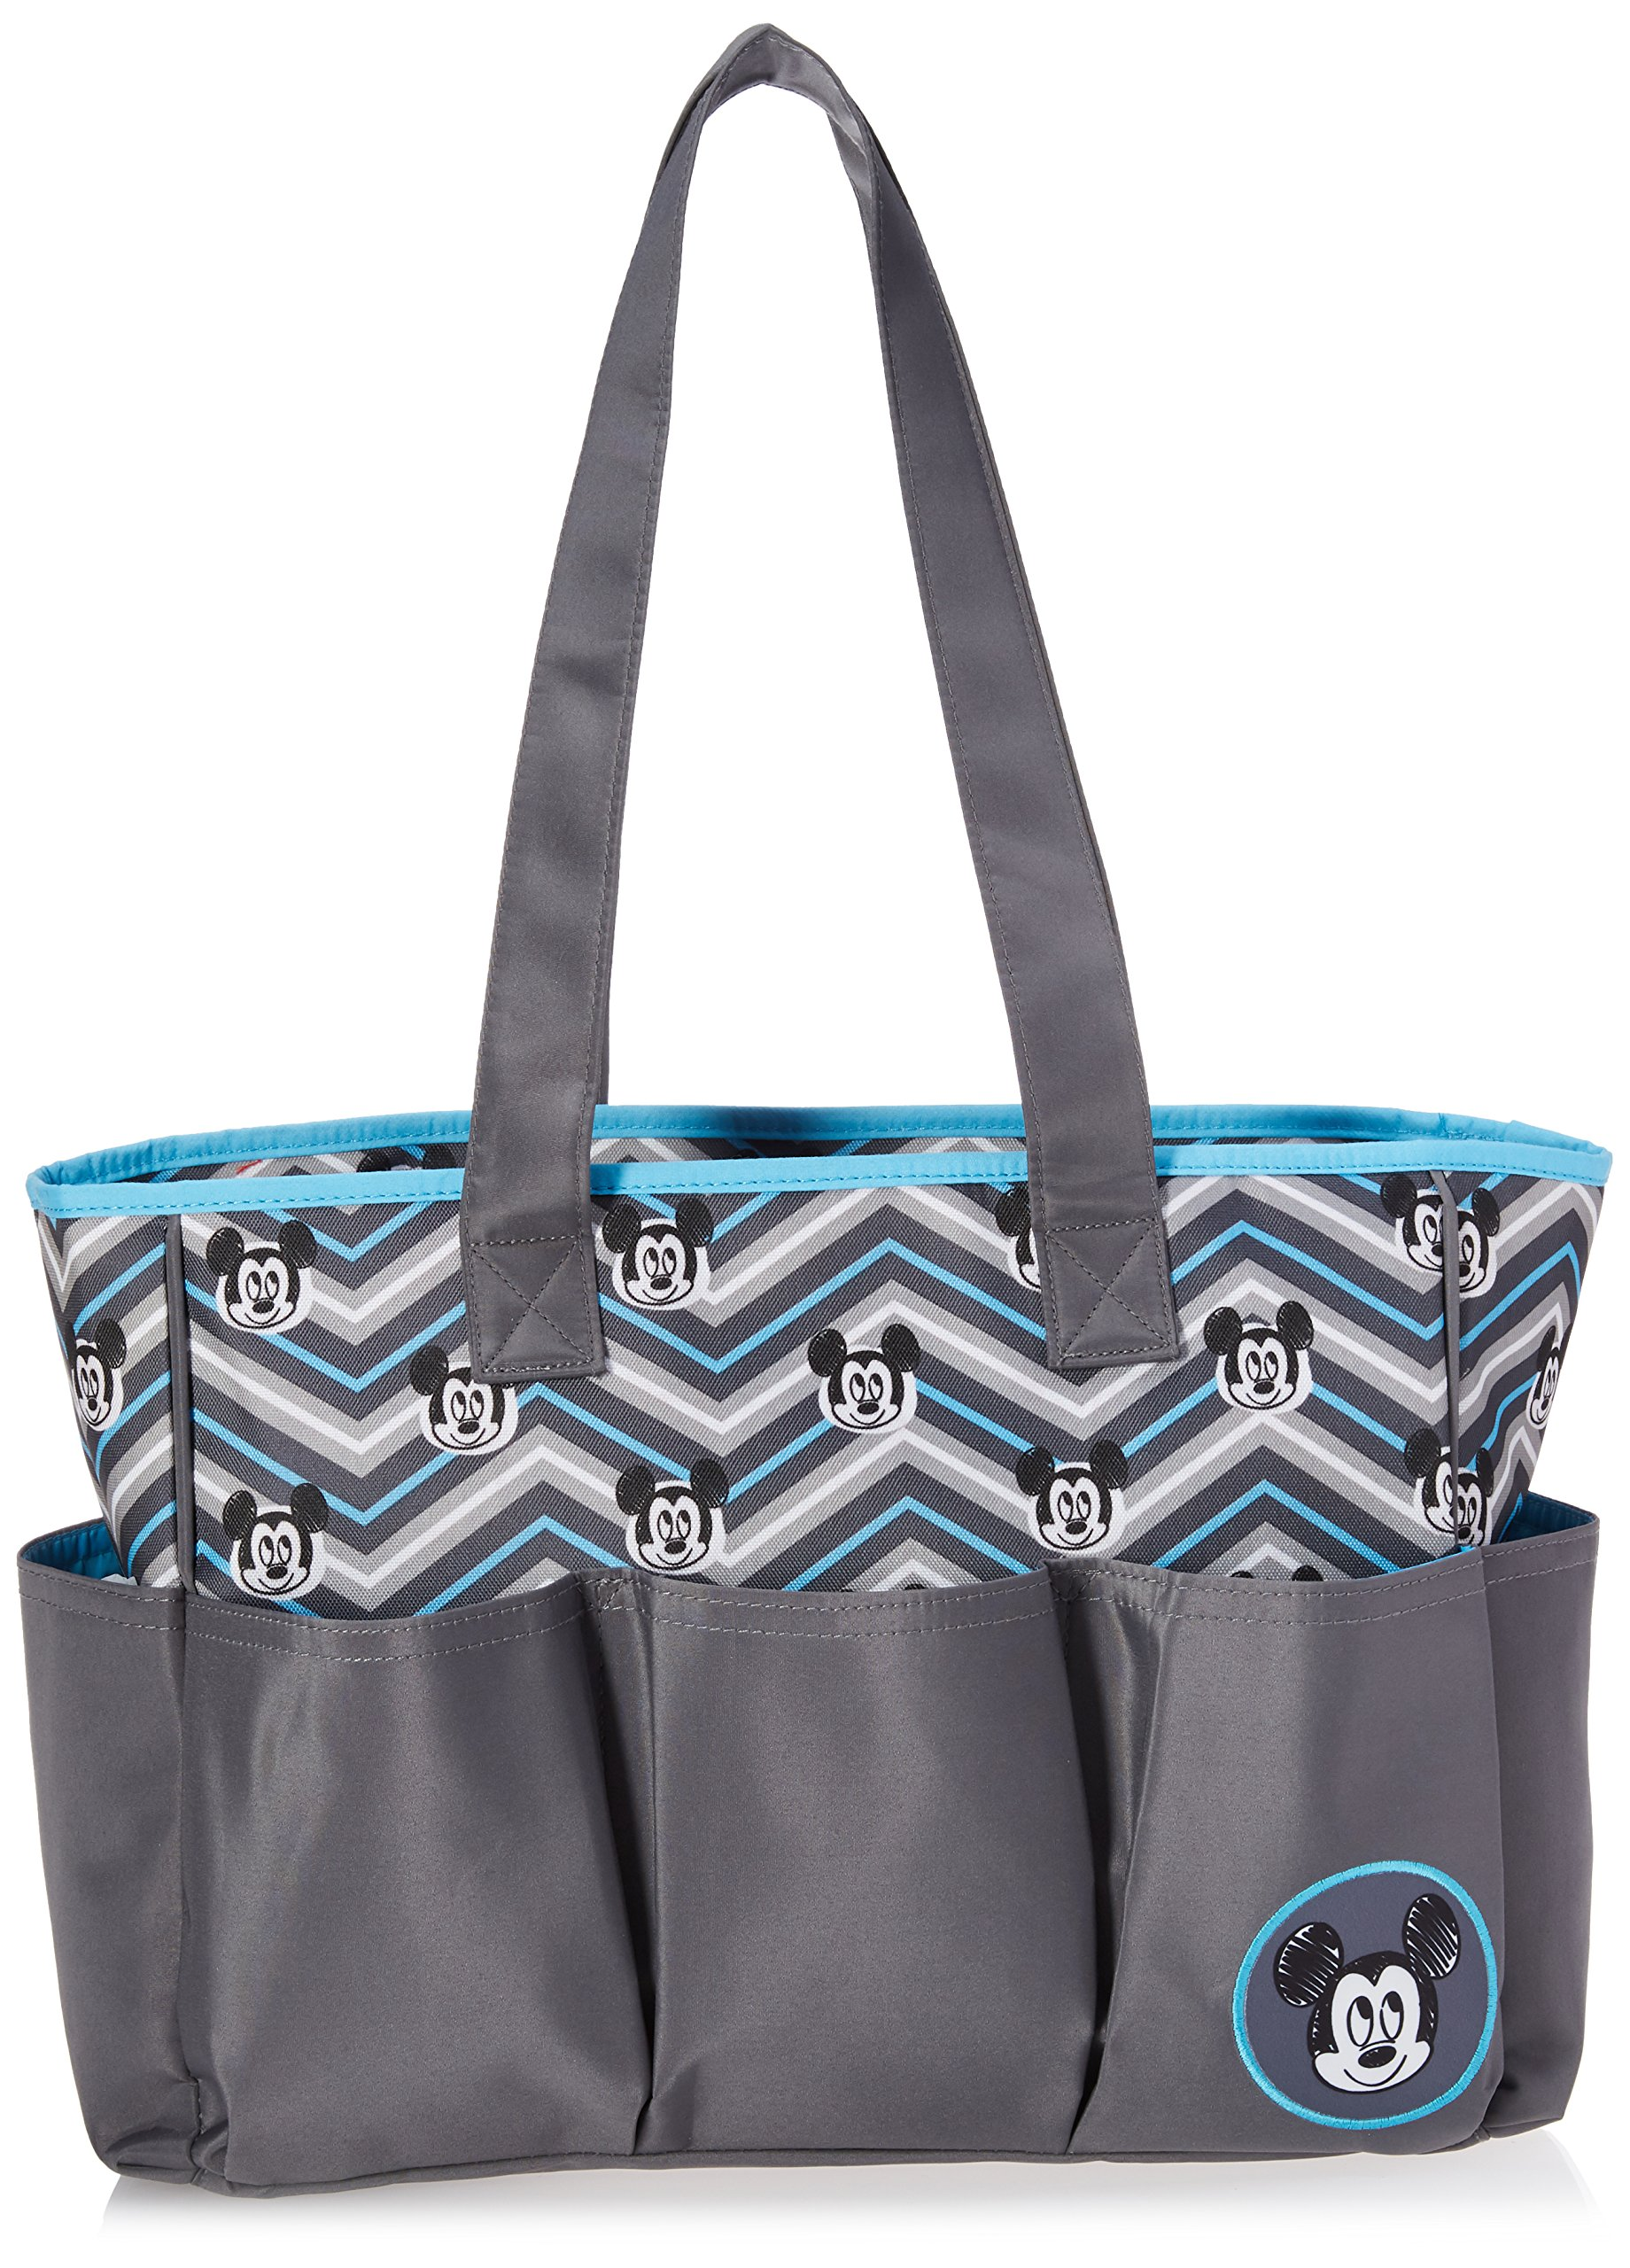 Disney Mickey Mouse Triple Pocket Multi Piece Diaper Bag Set, Chevron Print, Grey/Blue by Disney (Image #1)